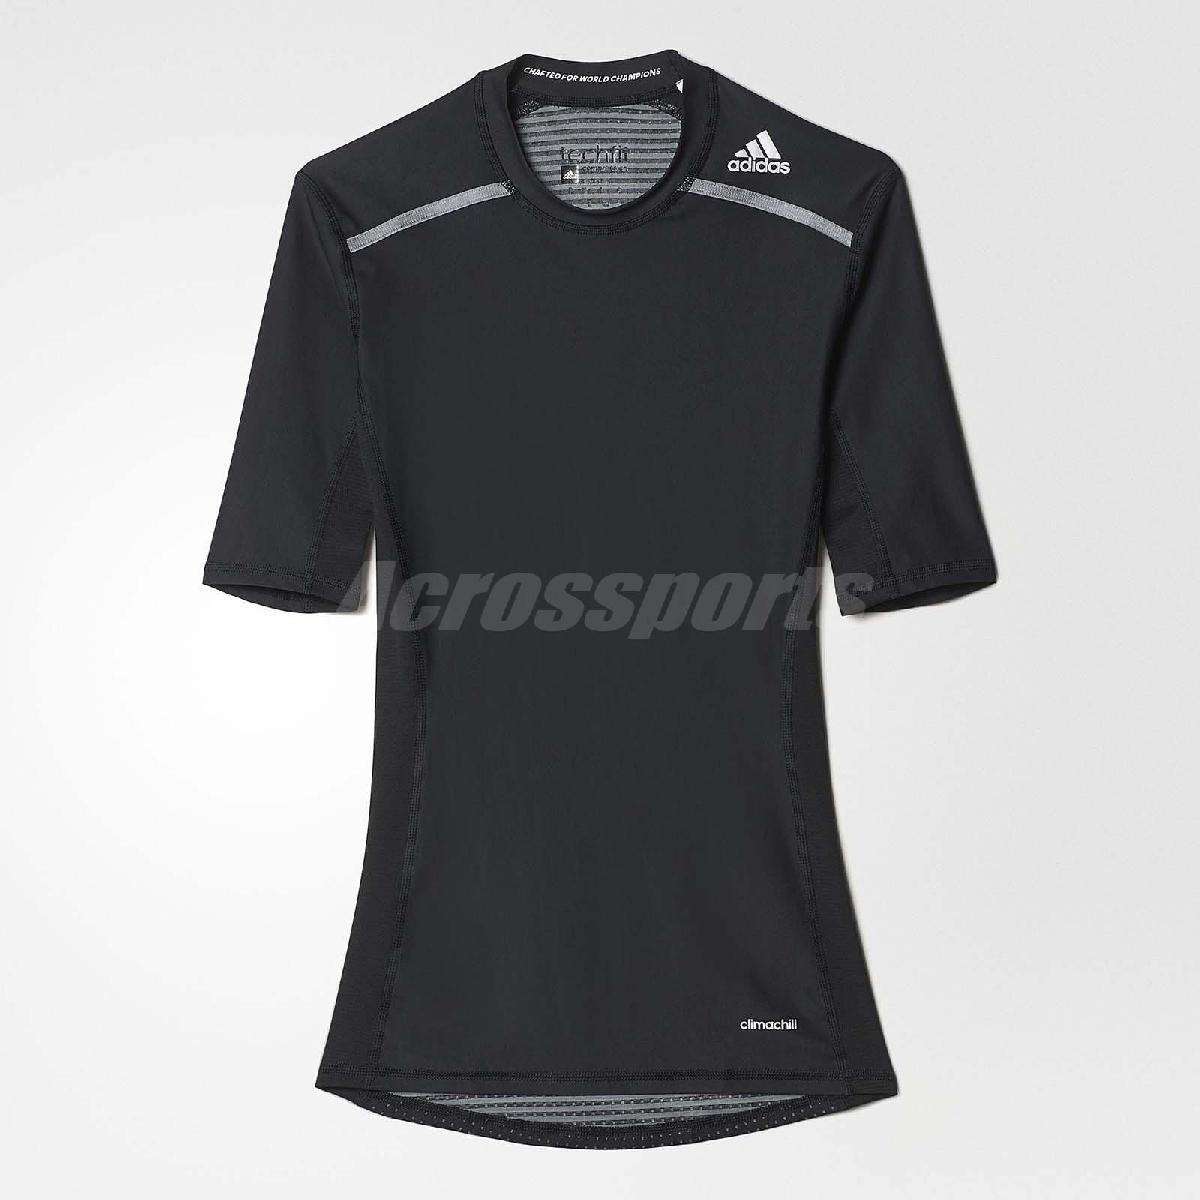 adidas T恤Techfit Chill黑銀TechFit運動短袖上衣男款PUMP306 AJ5705